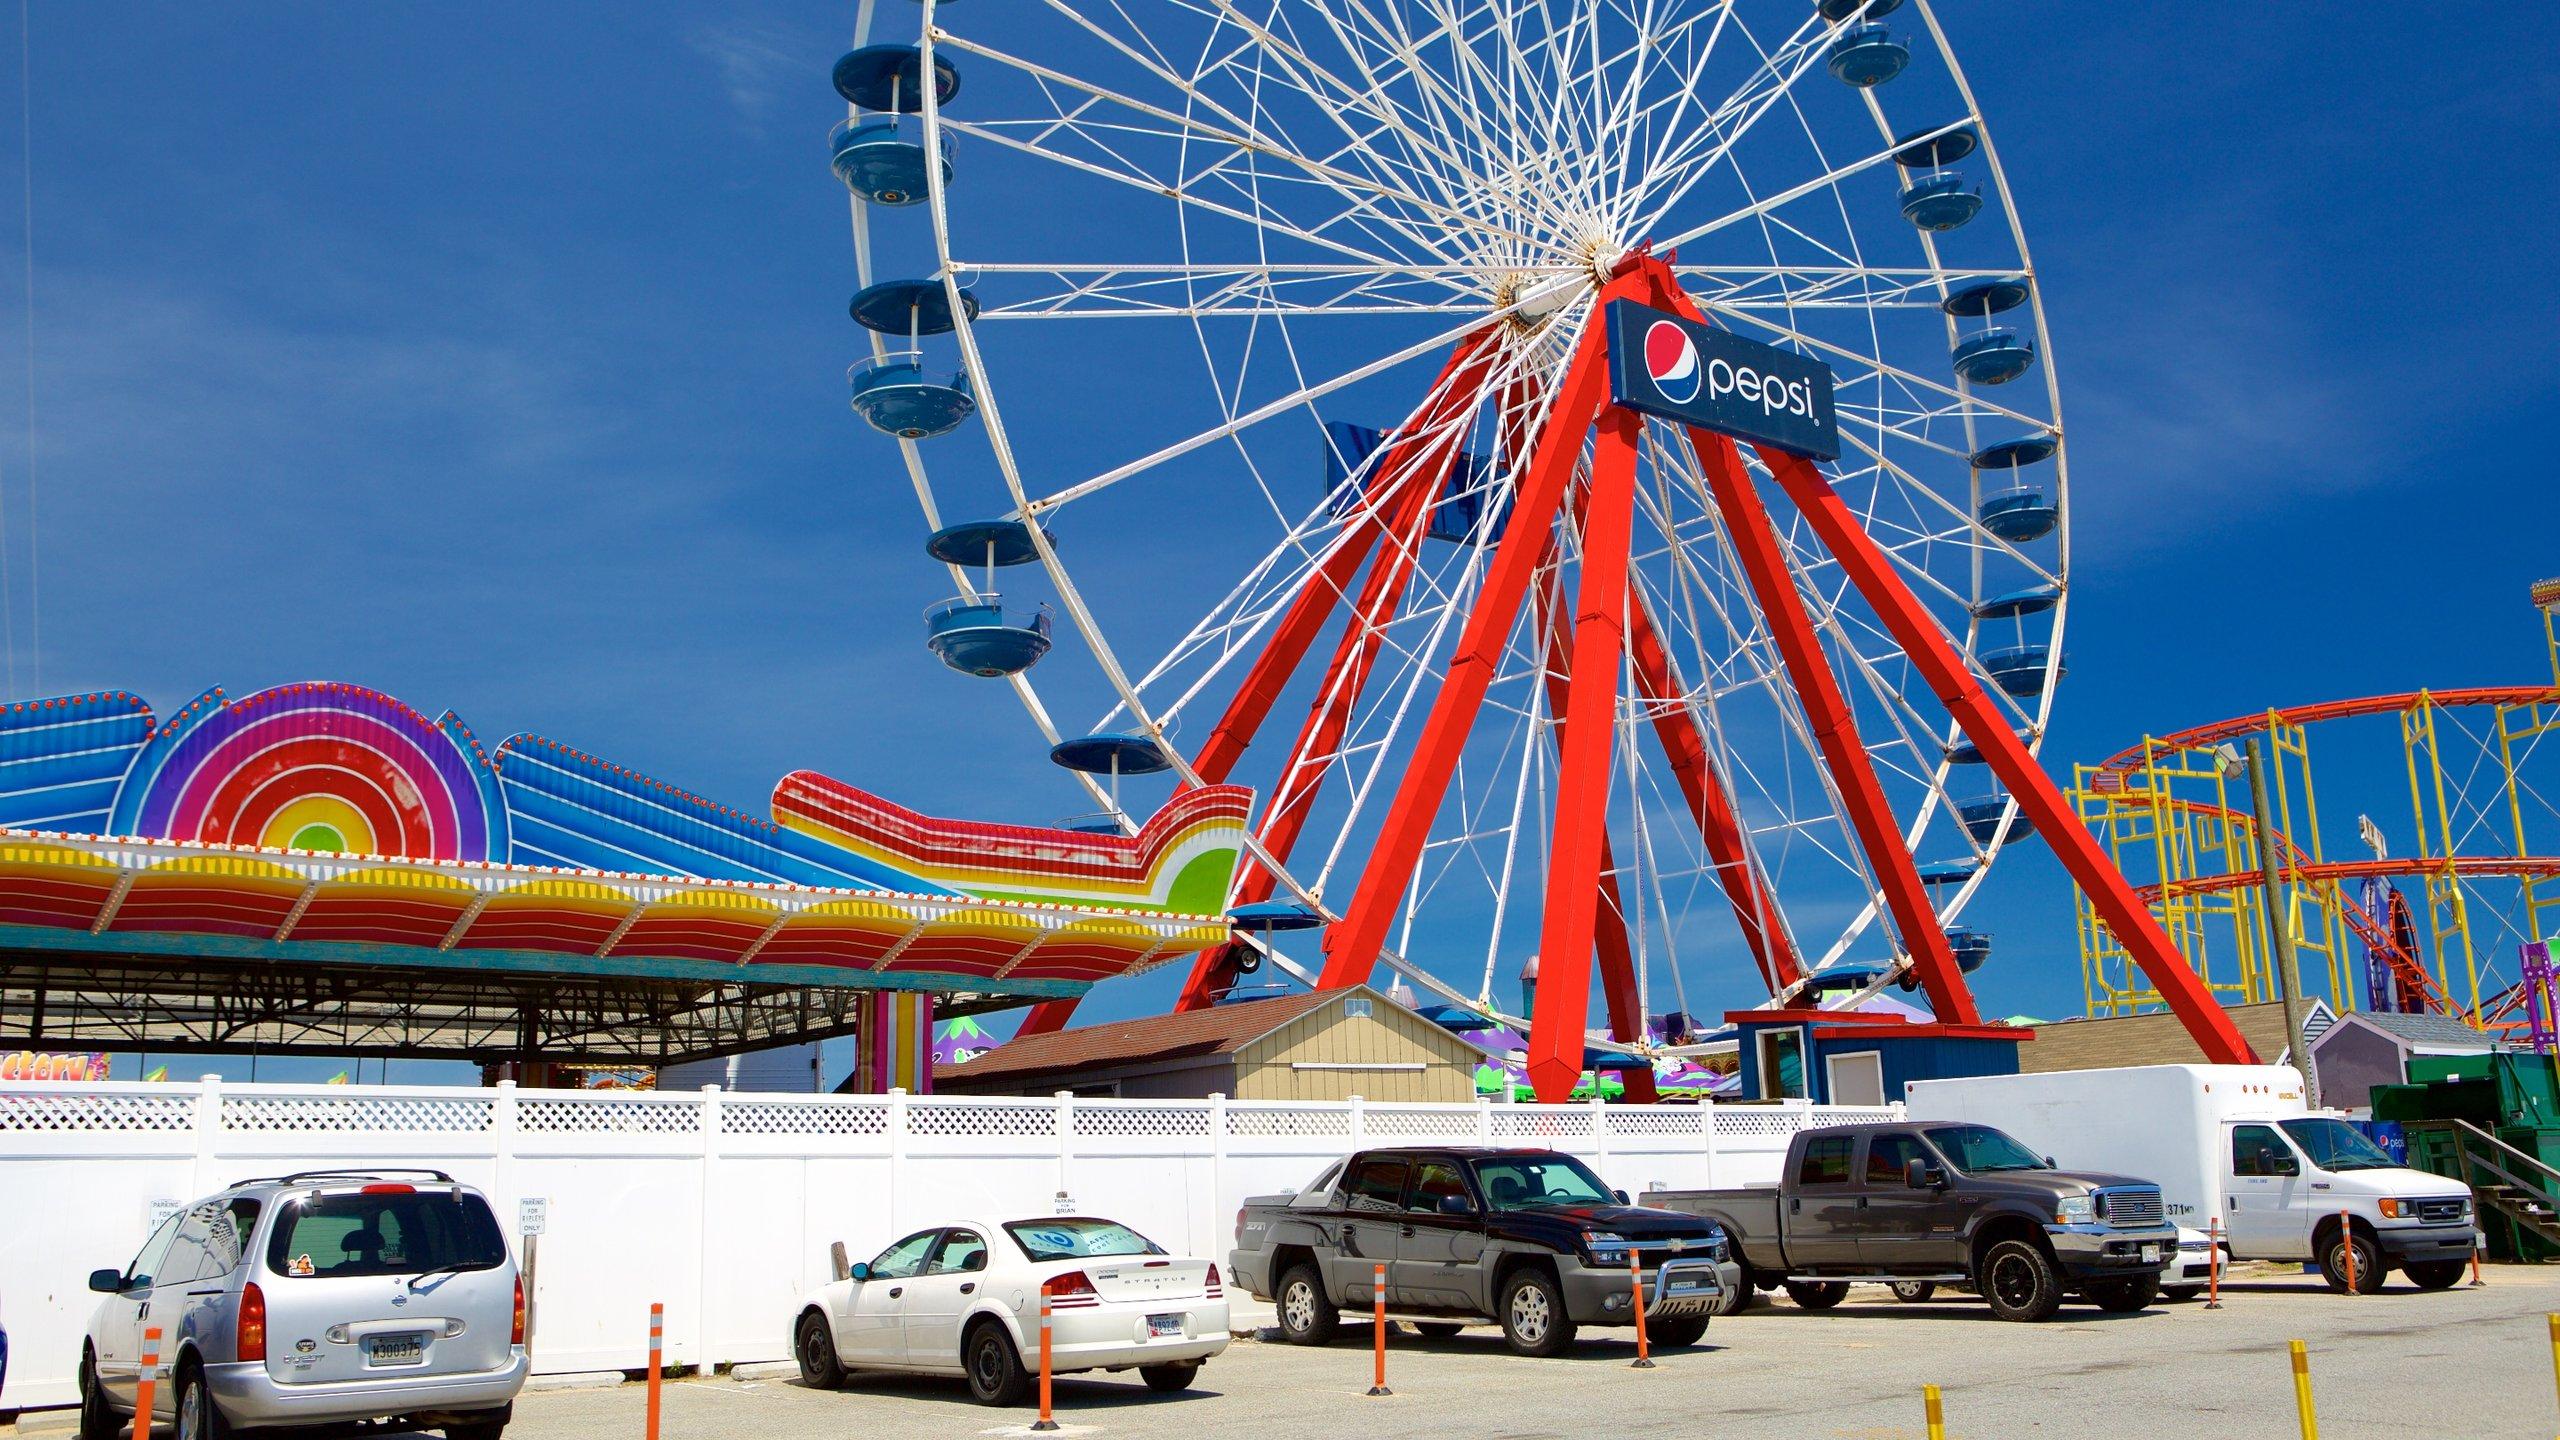 Ocean City, Maryland Vacation Rentals & Homes $53 | Expedia